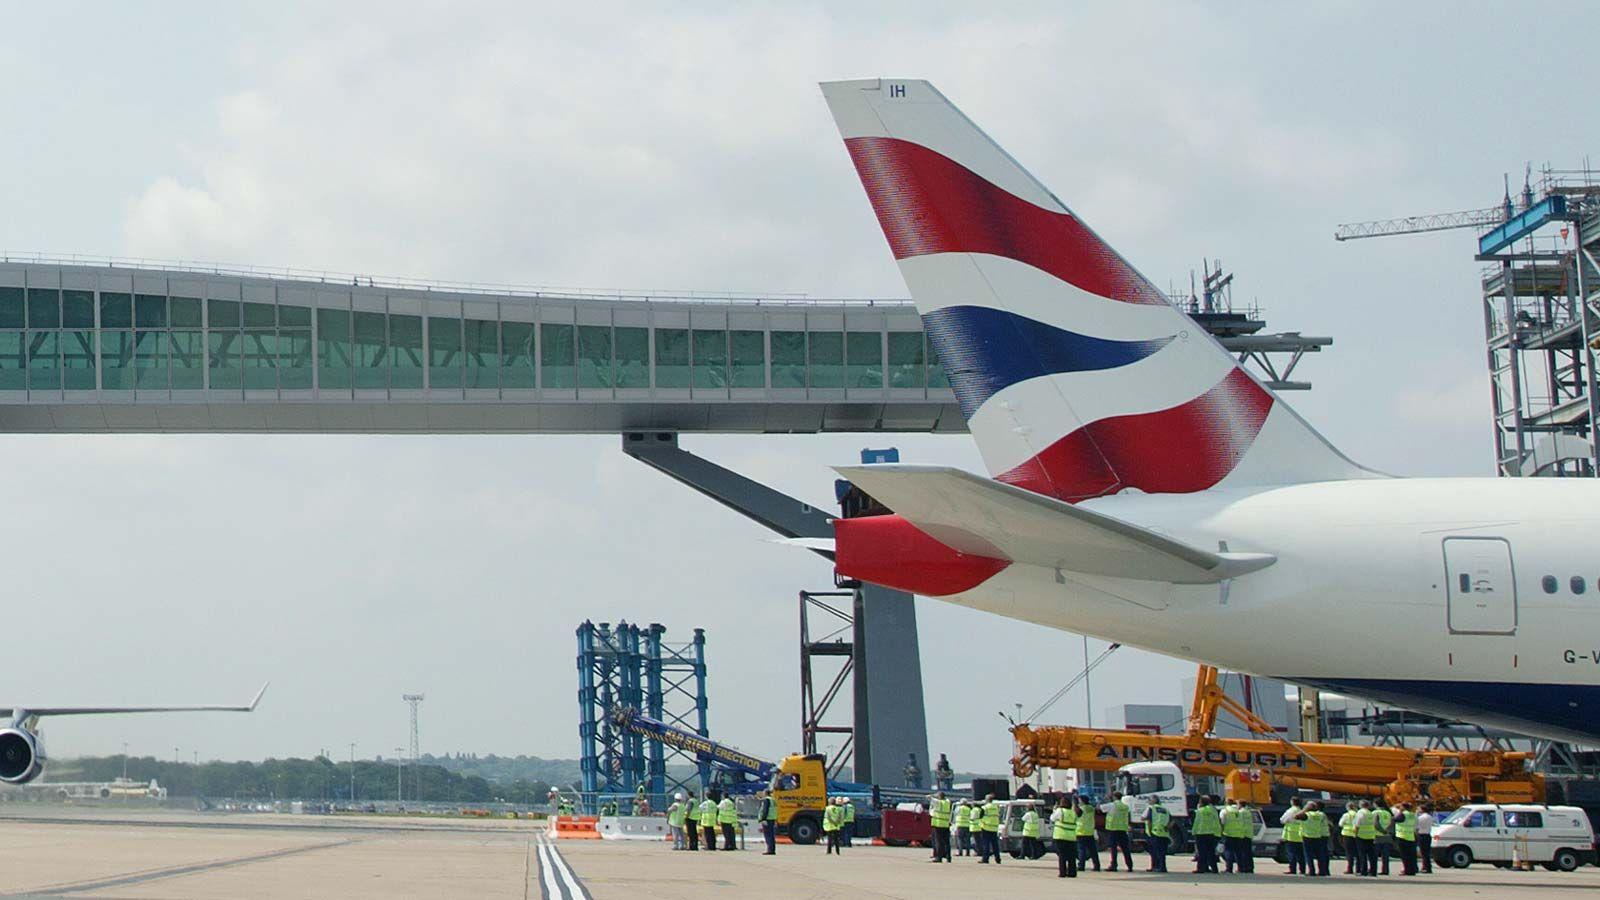 Gatwick Airport Pier - Mace Group